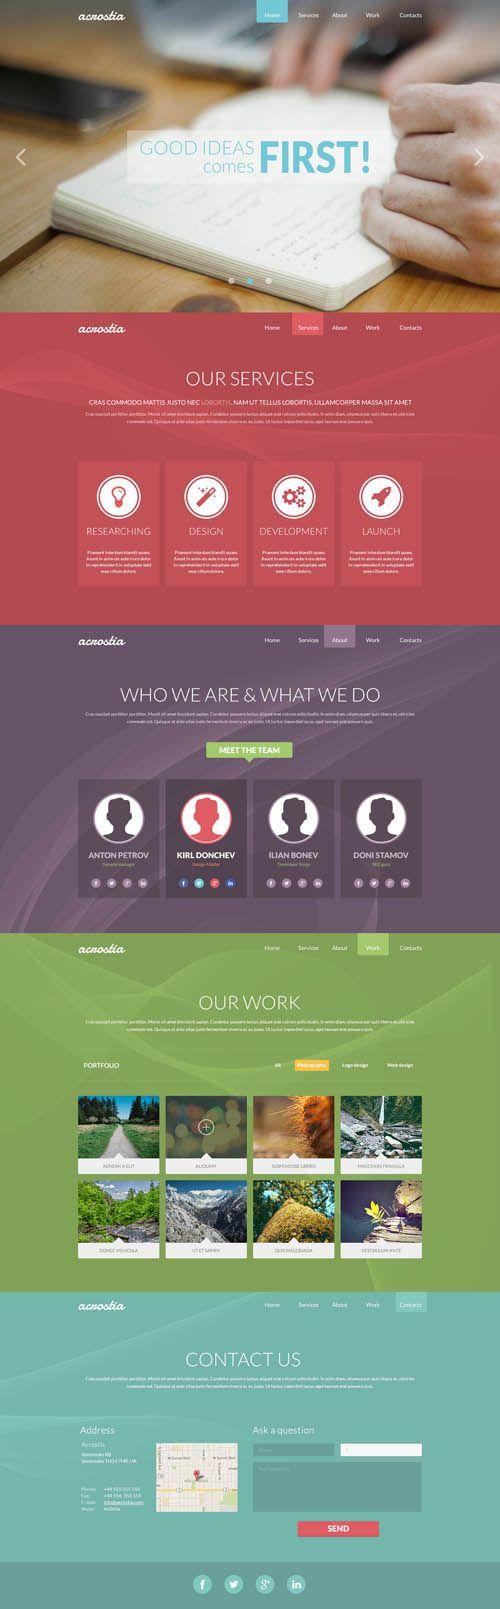 Freebies: 50 Flat Design PSD Elements for Designers | Graphics Design | Design Blog